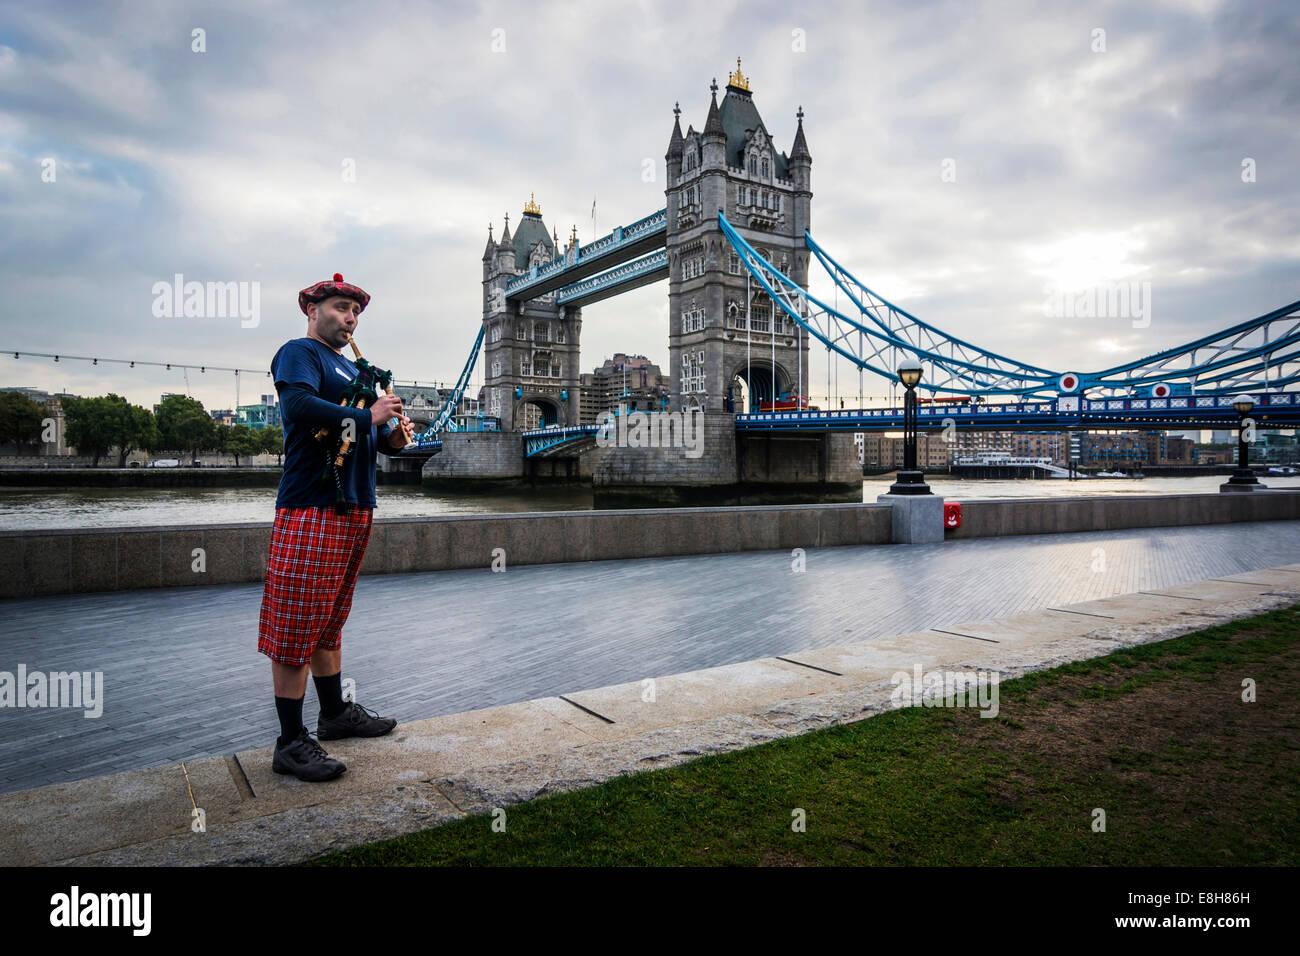 UK, London, schottischer Dudelsackspieler an der Tower Bridge Stockbild